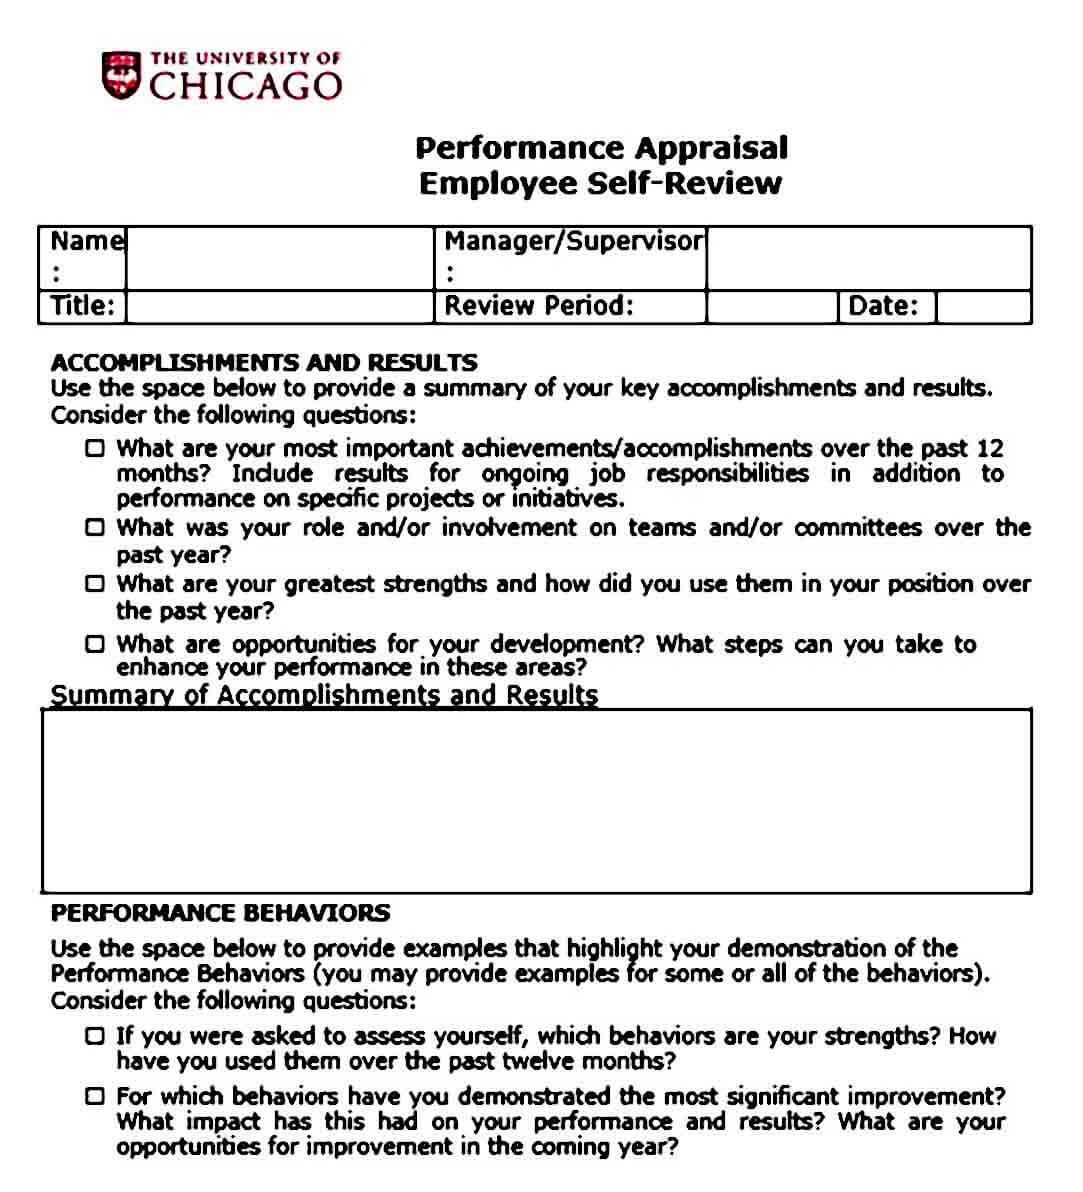 Performance Appraisal Employee Self Review